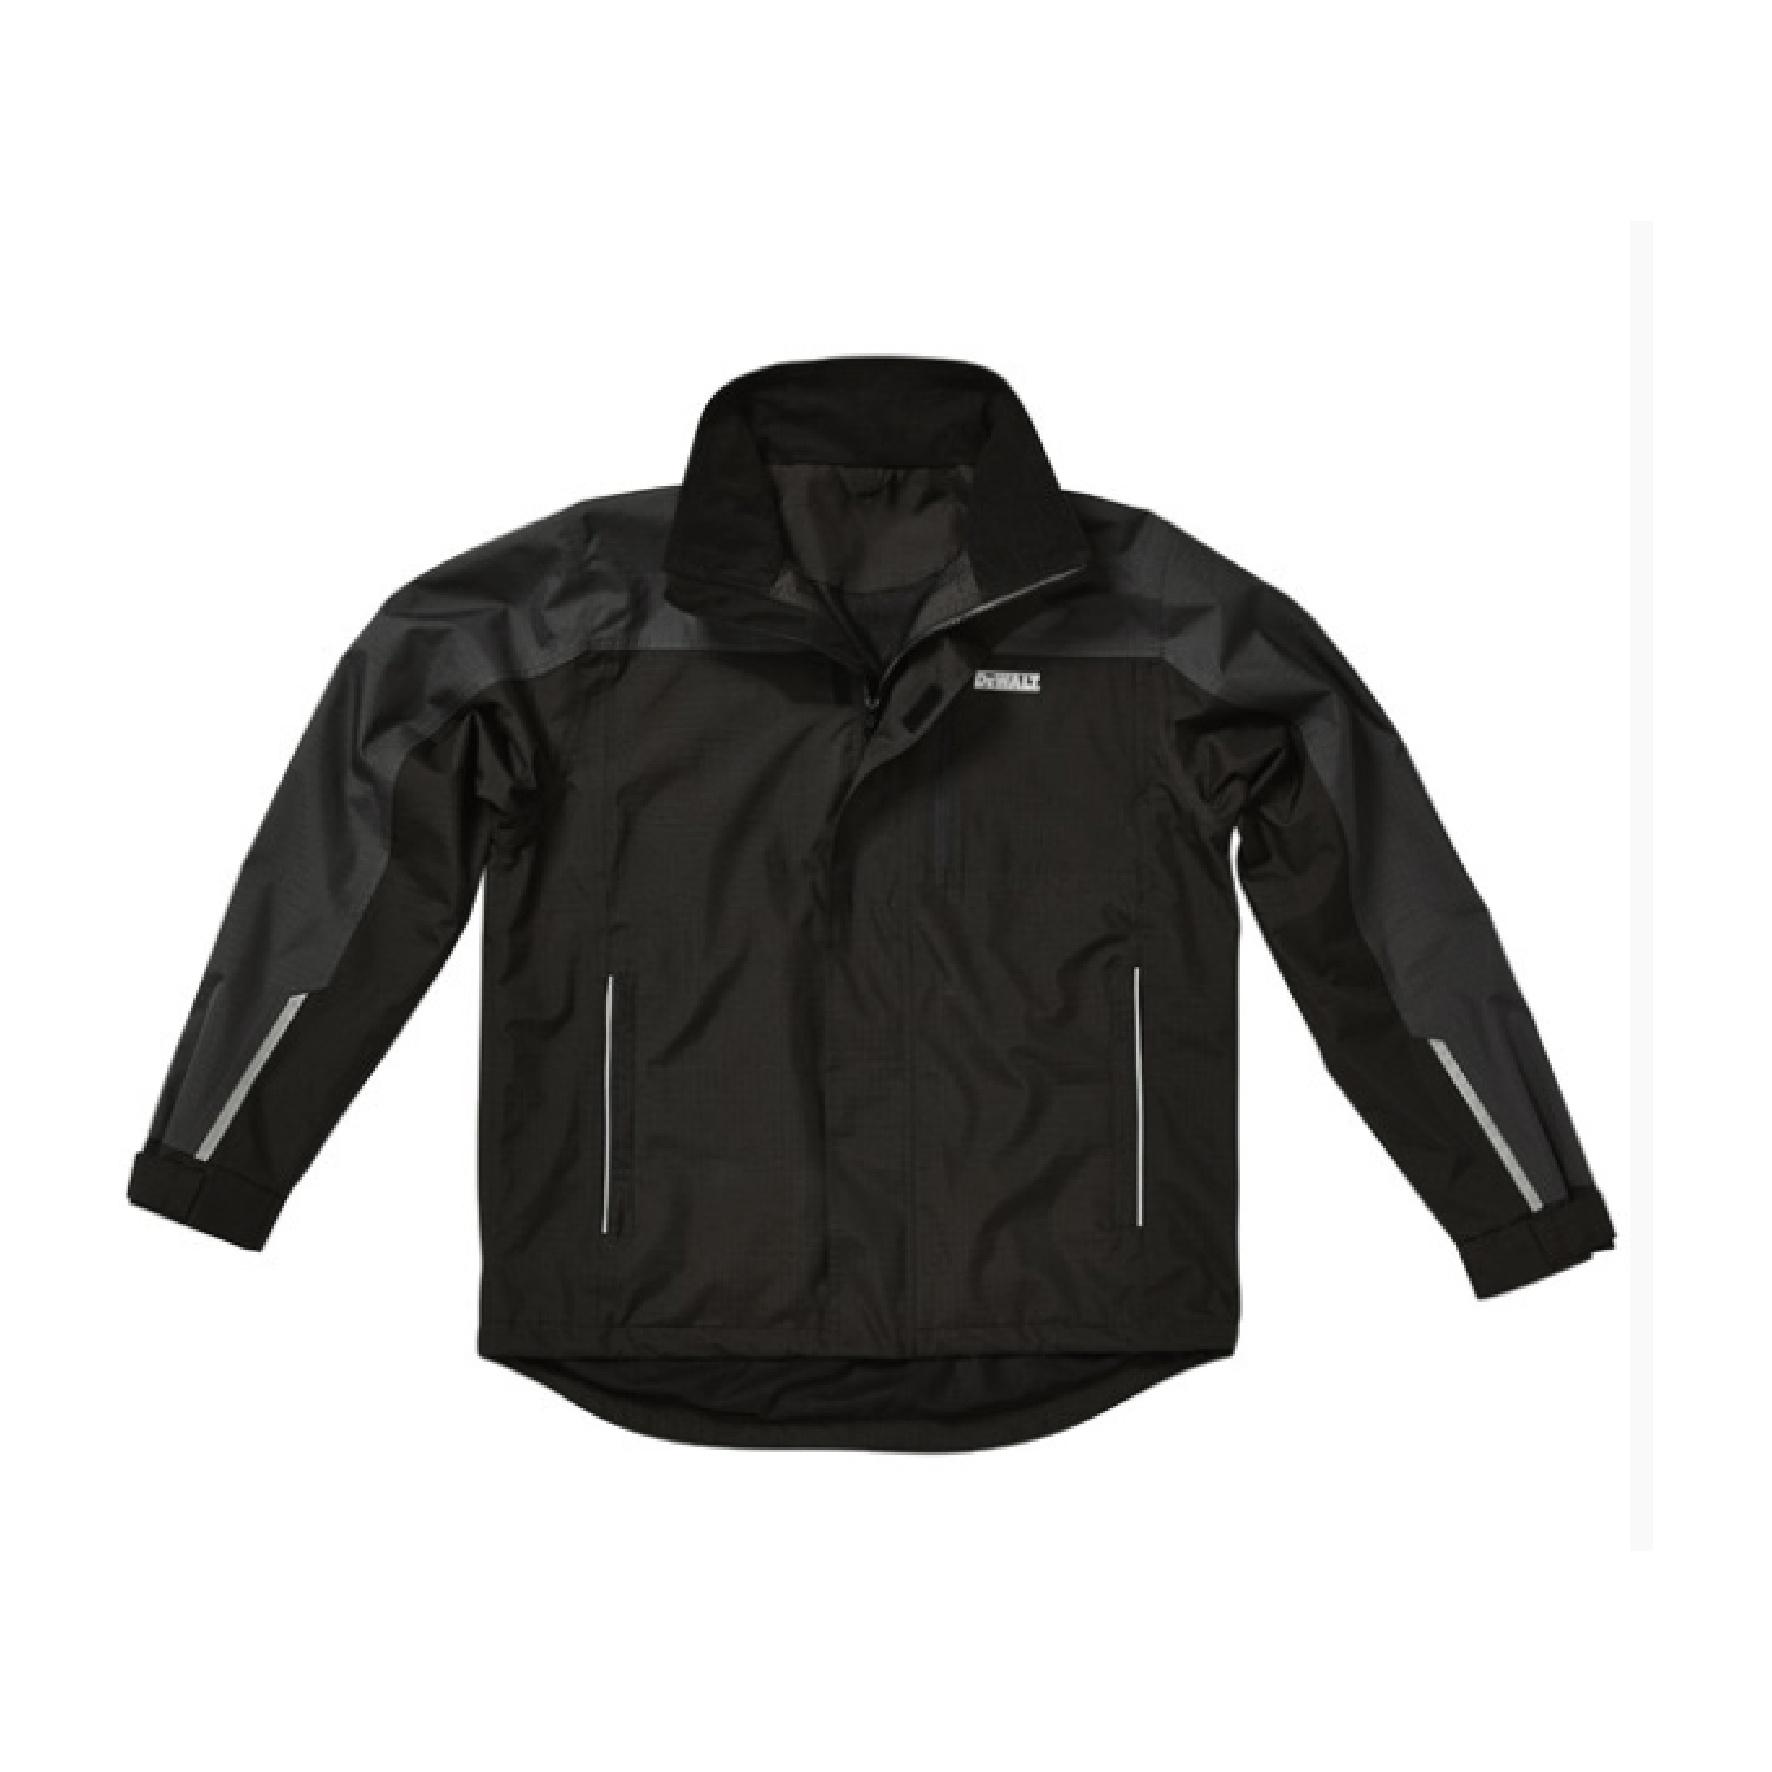 Redrok Workwear Centre Plymouth - DeWalt Storm Jacket